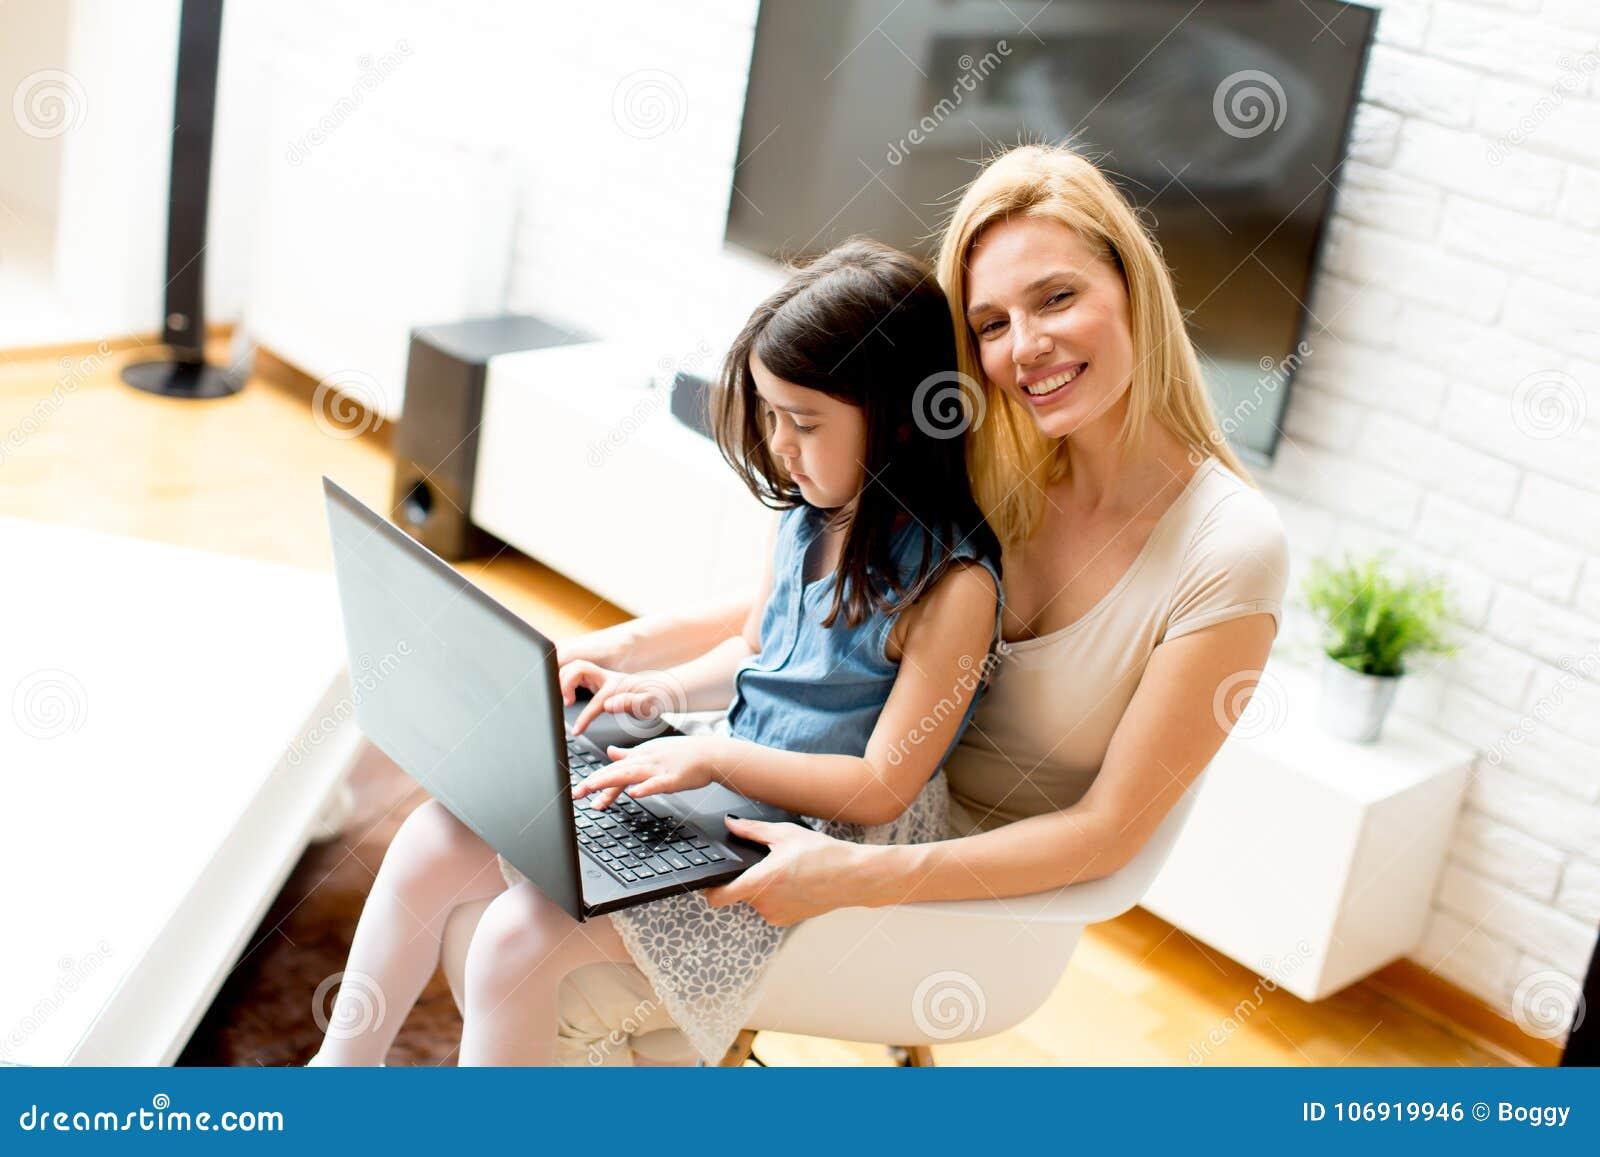 Matka i córka wraz z laptopem